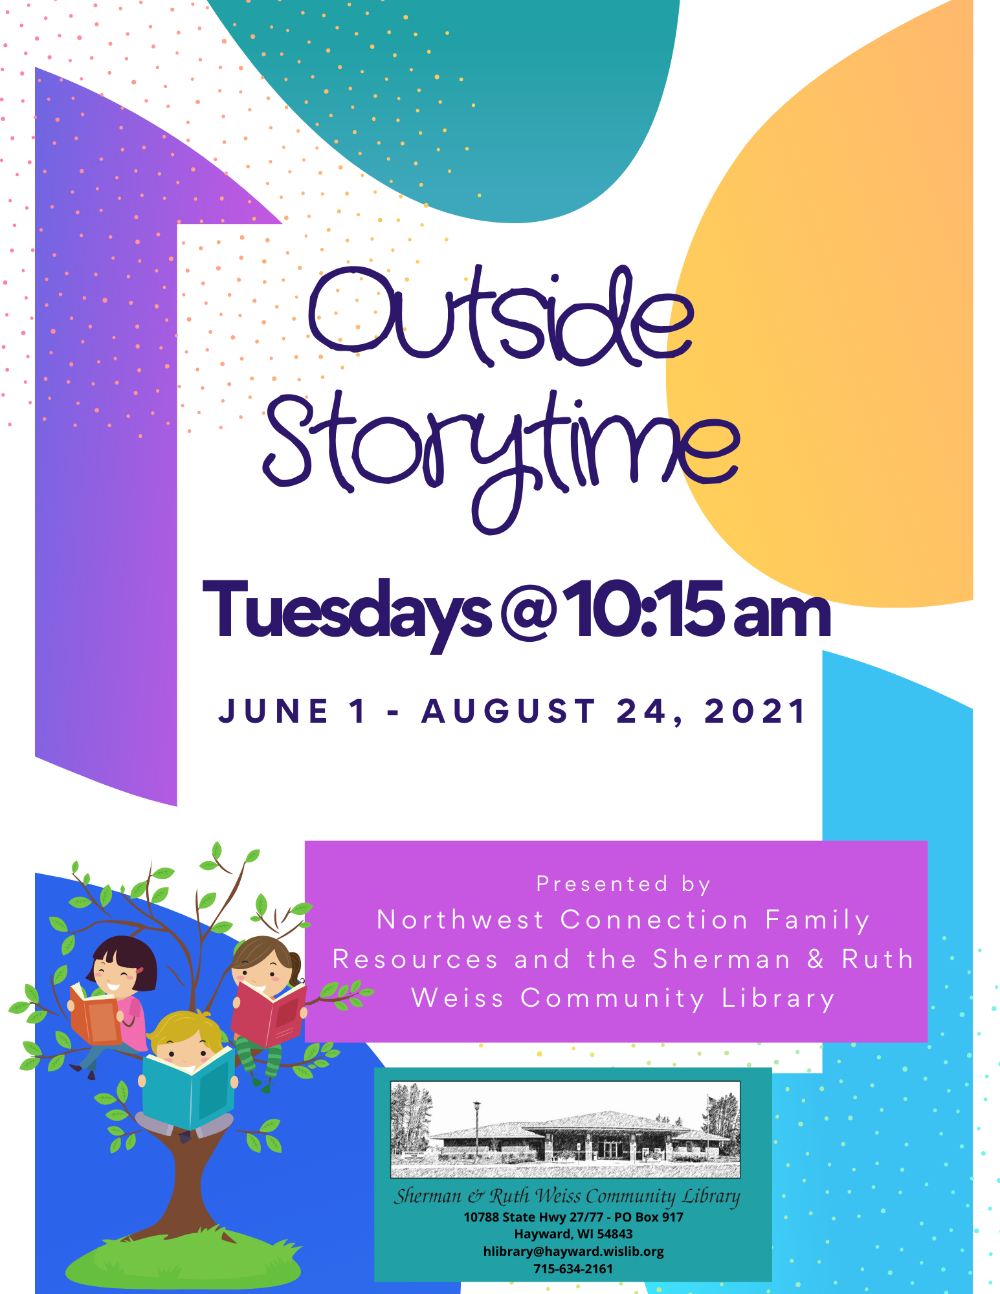 Outdoor Storytime runs June through August 24, 2021